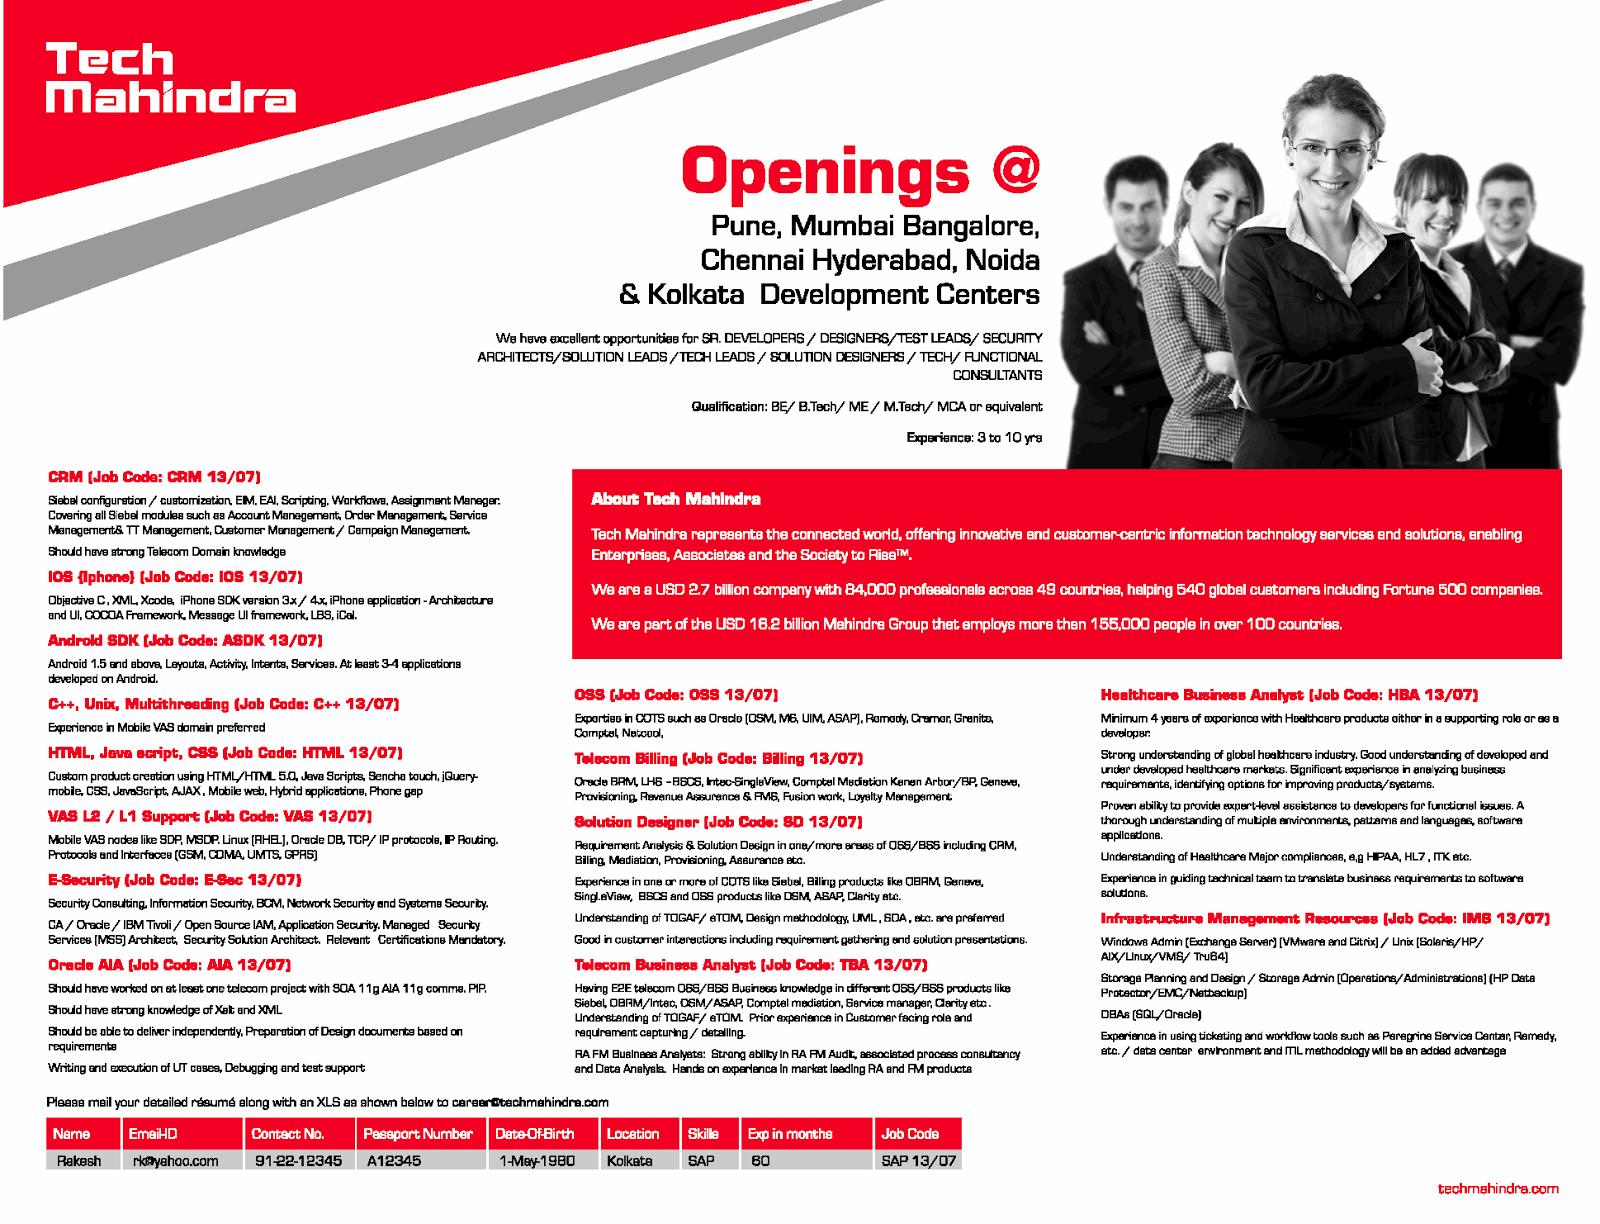 IT, Engineering & Technical Jobs in India: Tech Mahindra ...